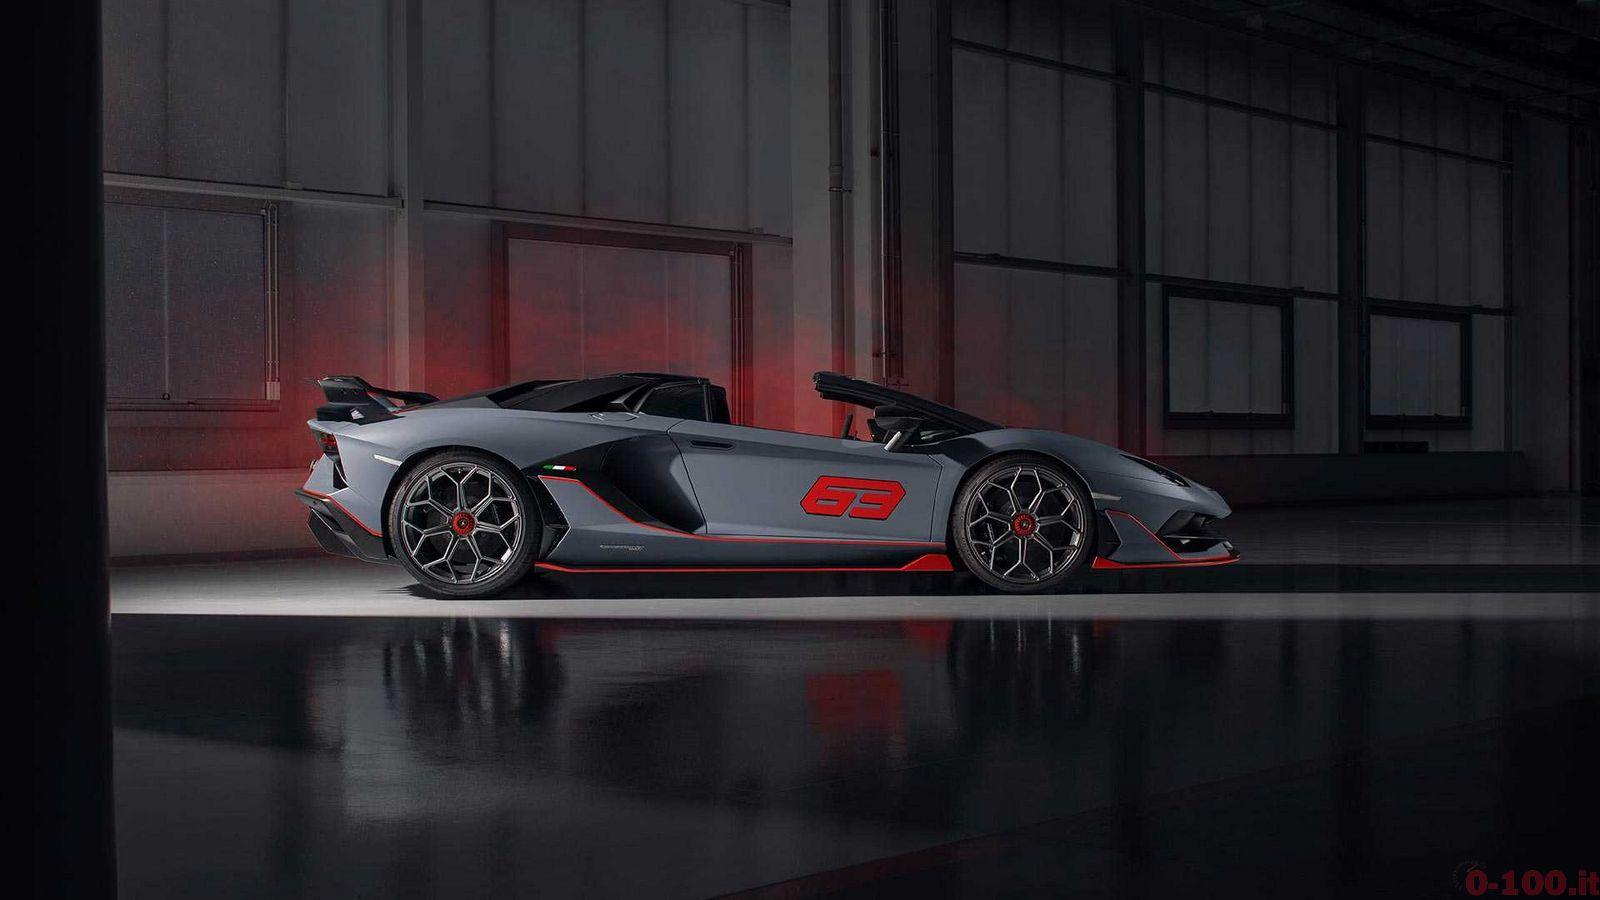 Lamborghini_Aventador_SVJ_63_Roadster_0-100_4